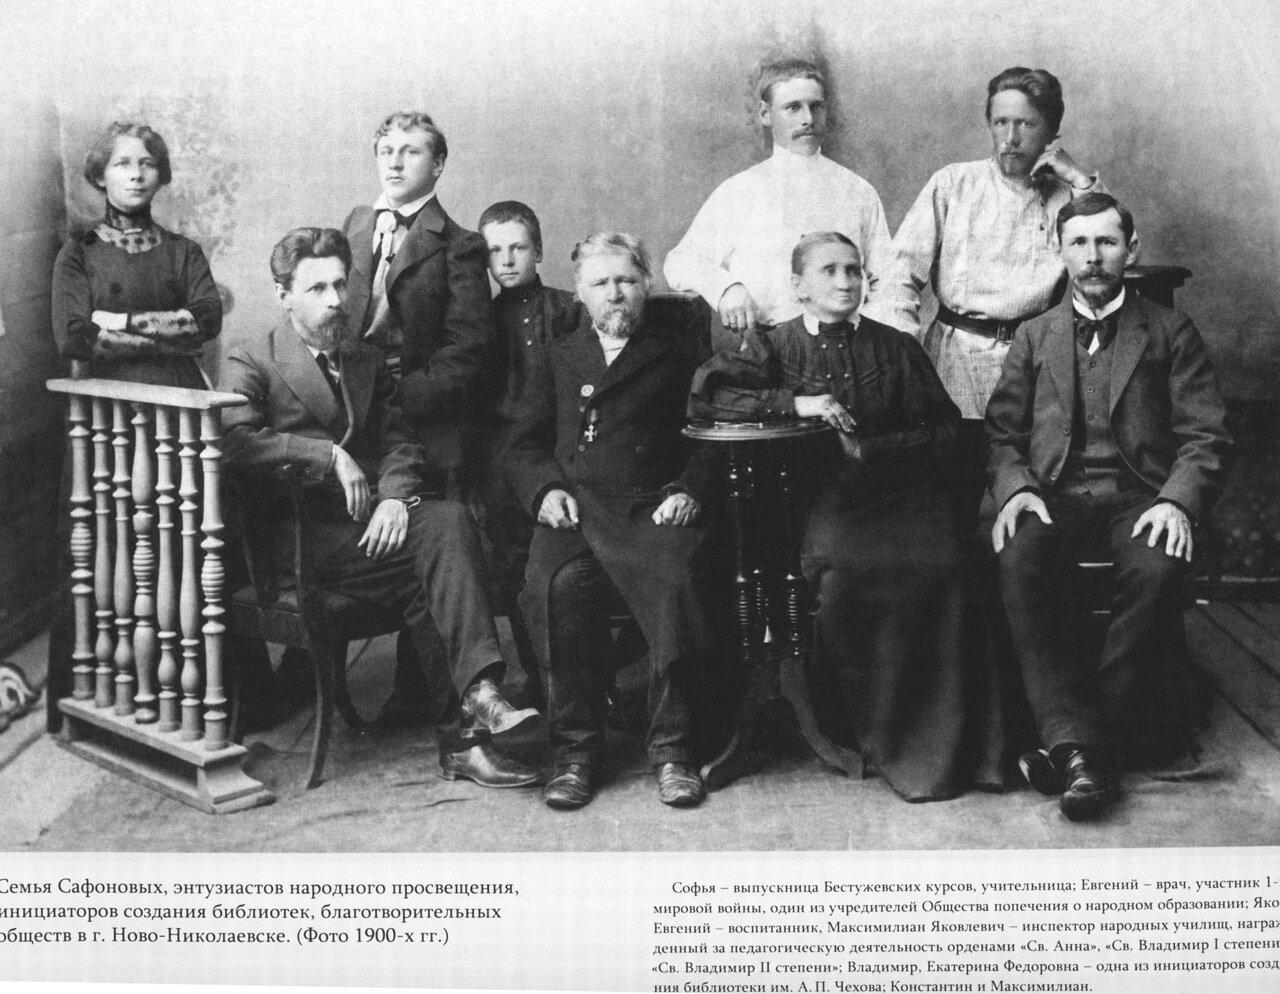 Семья Сафоновых, 1900-е годы